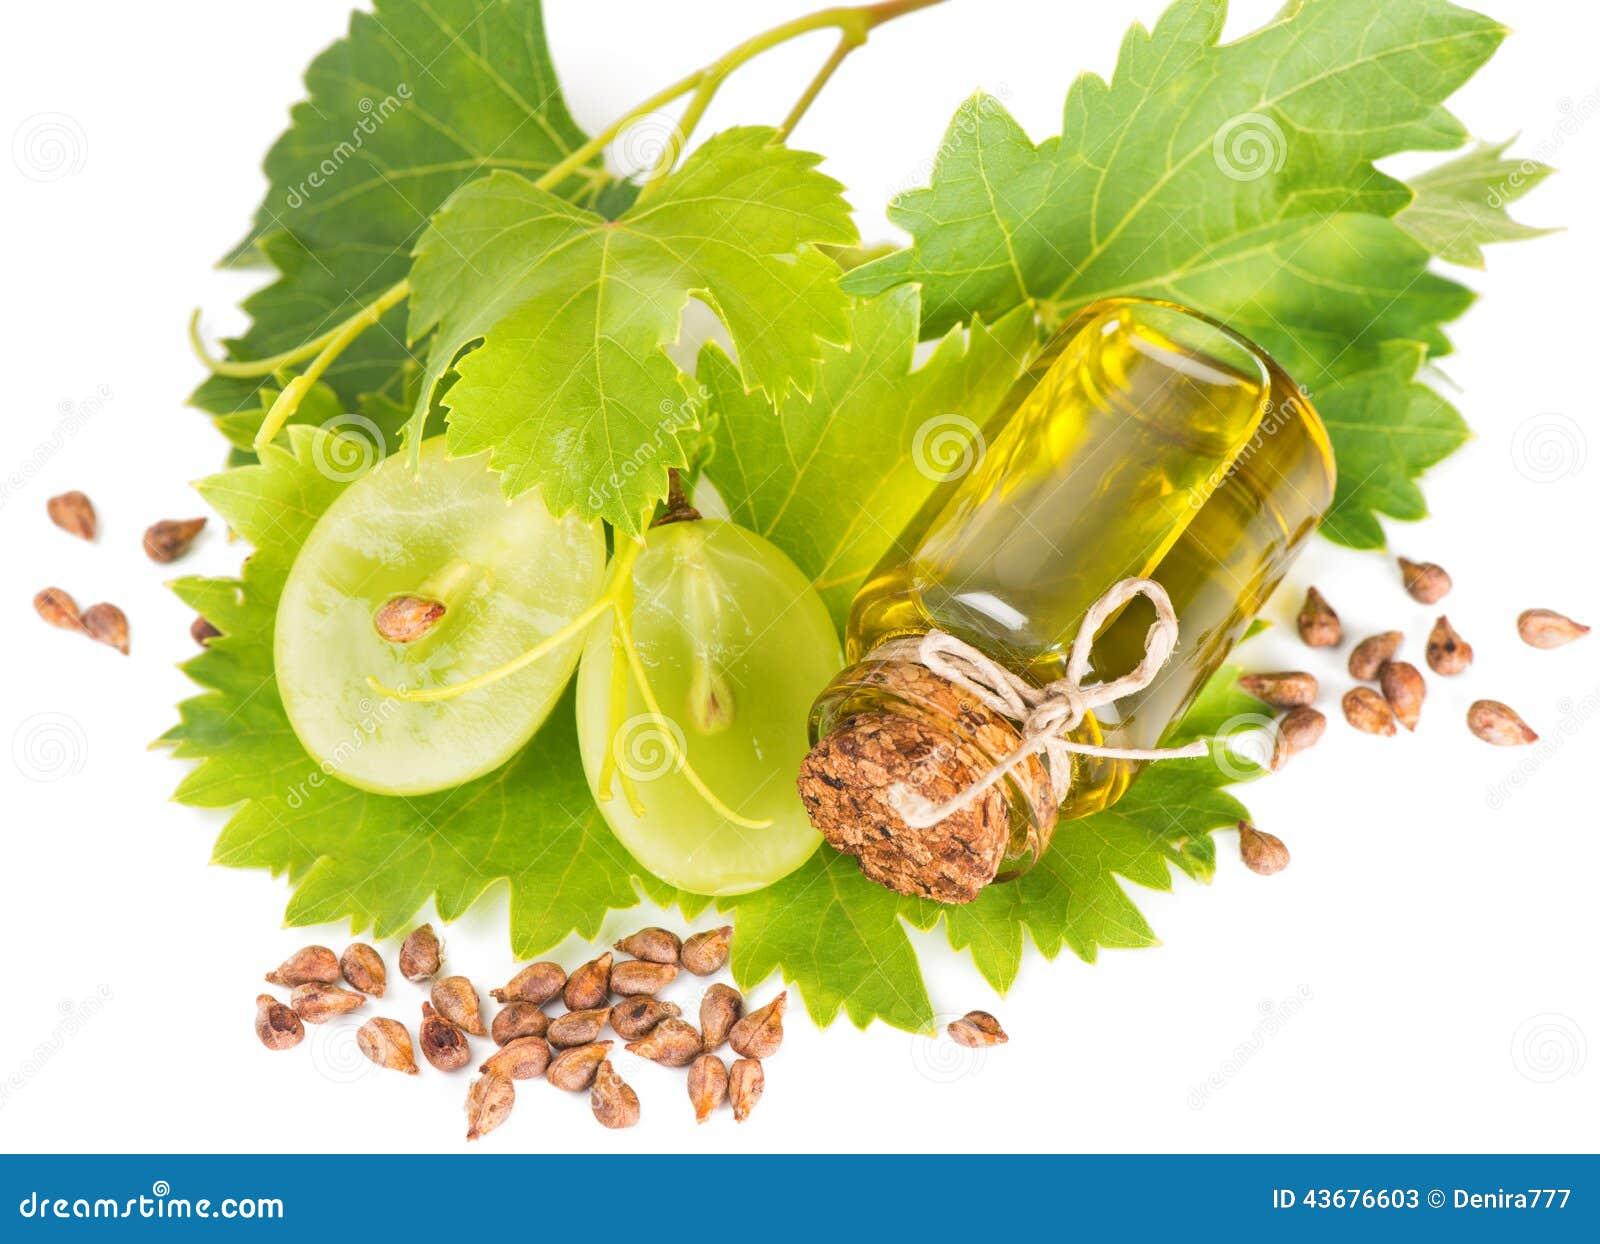 how to take grape seed oil